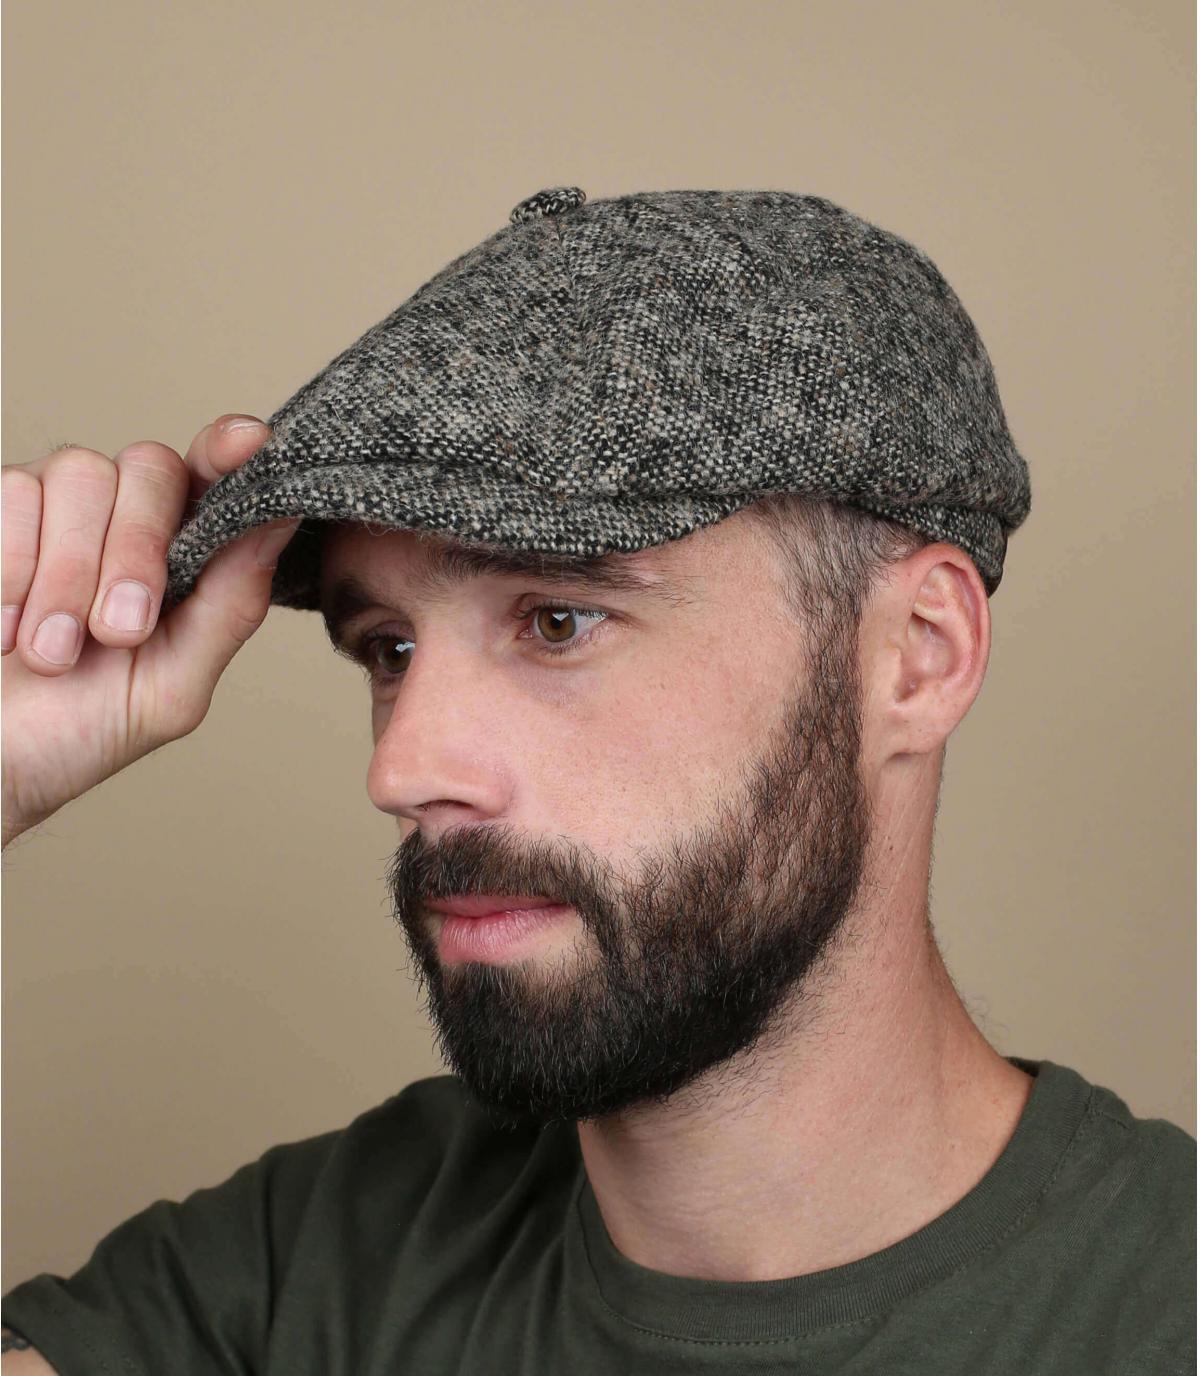 Rough wool cap